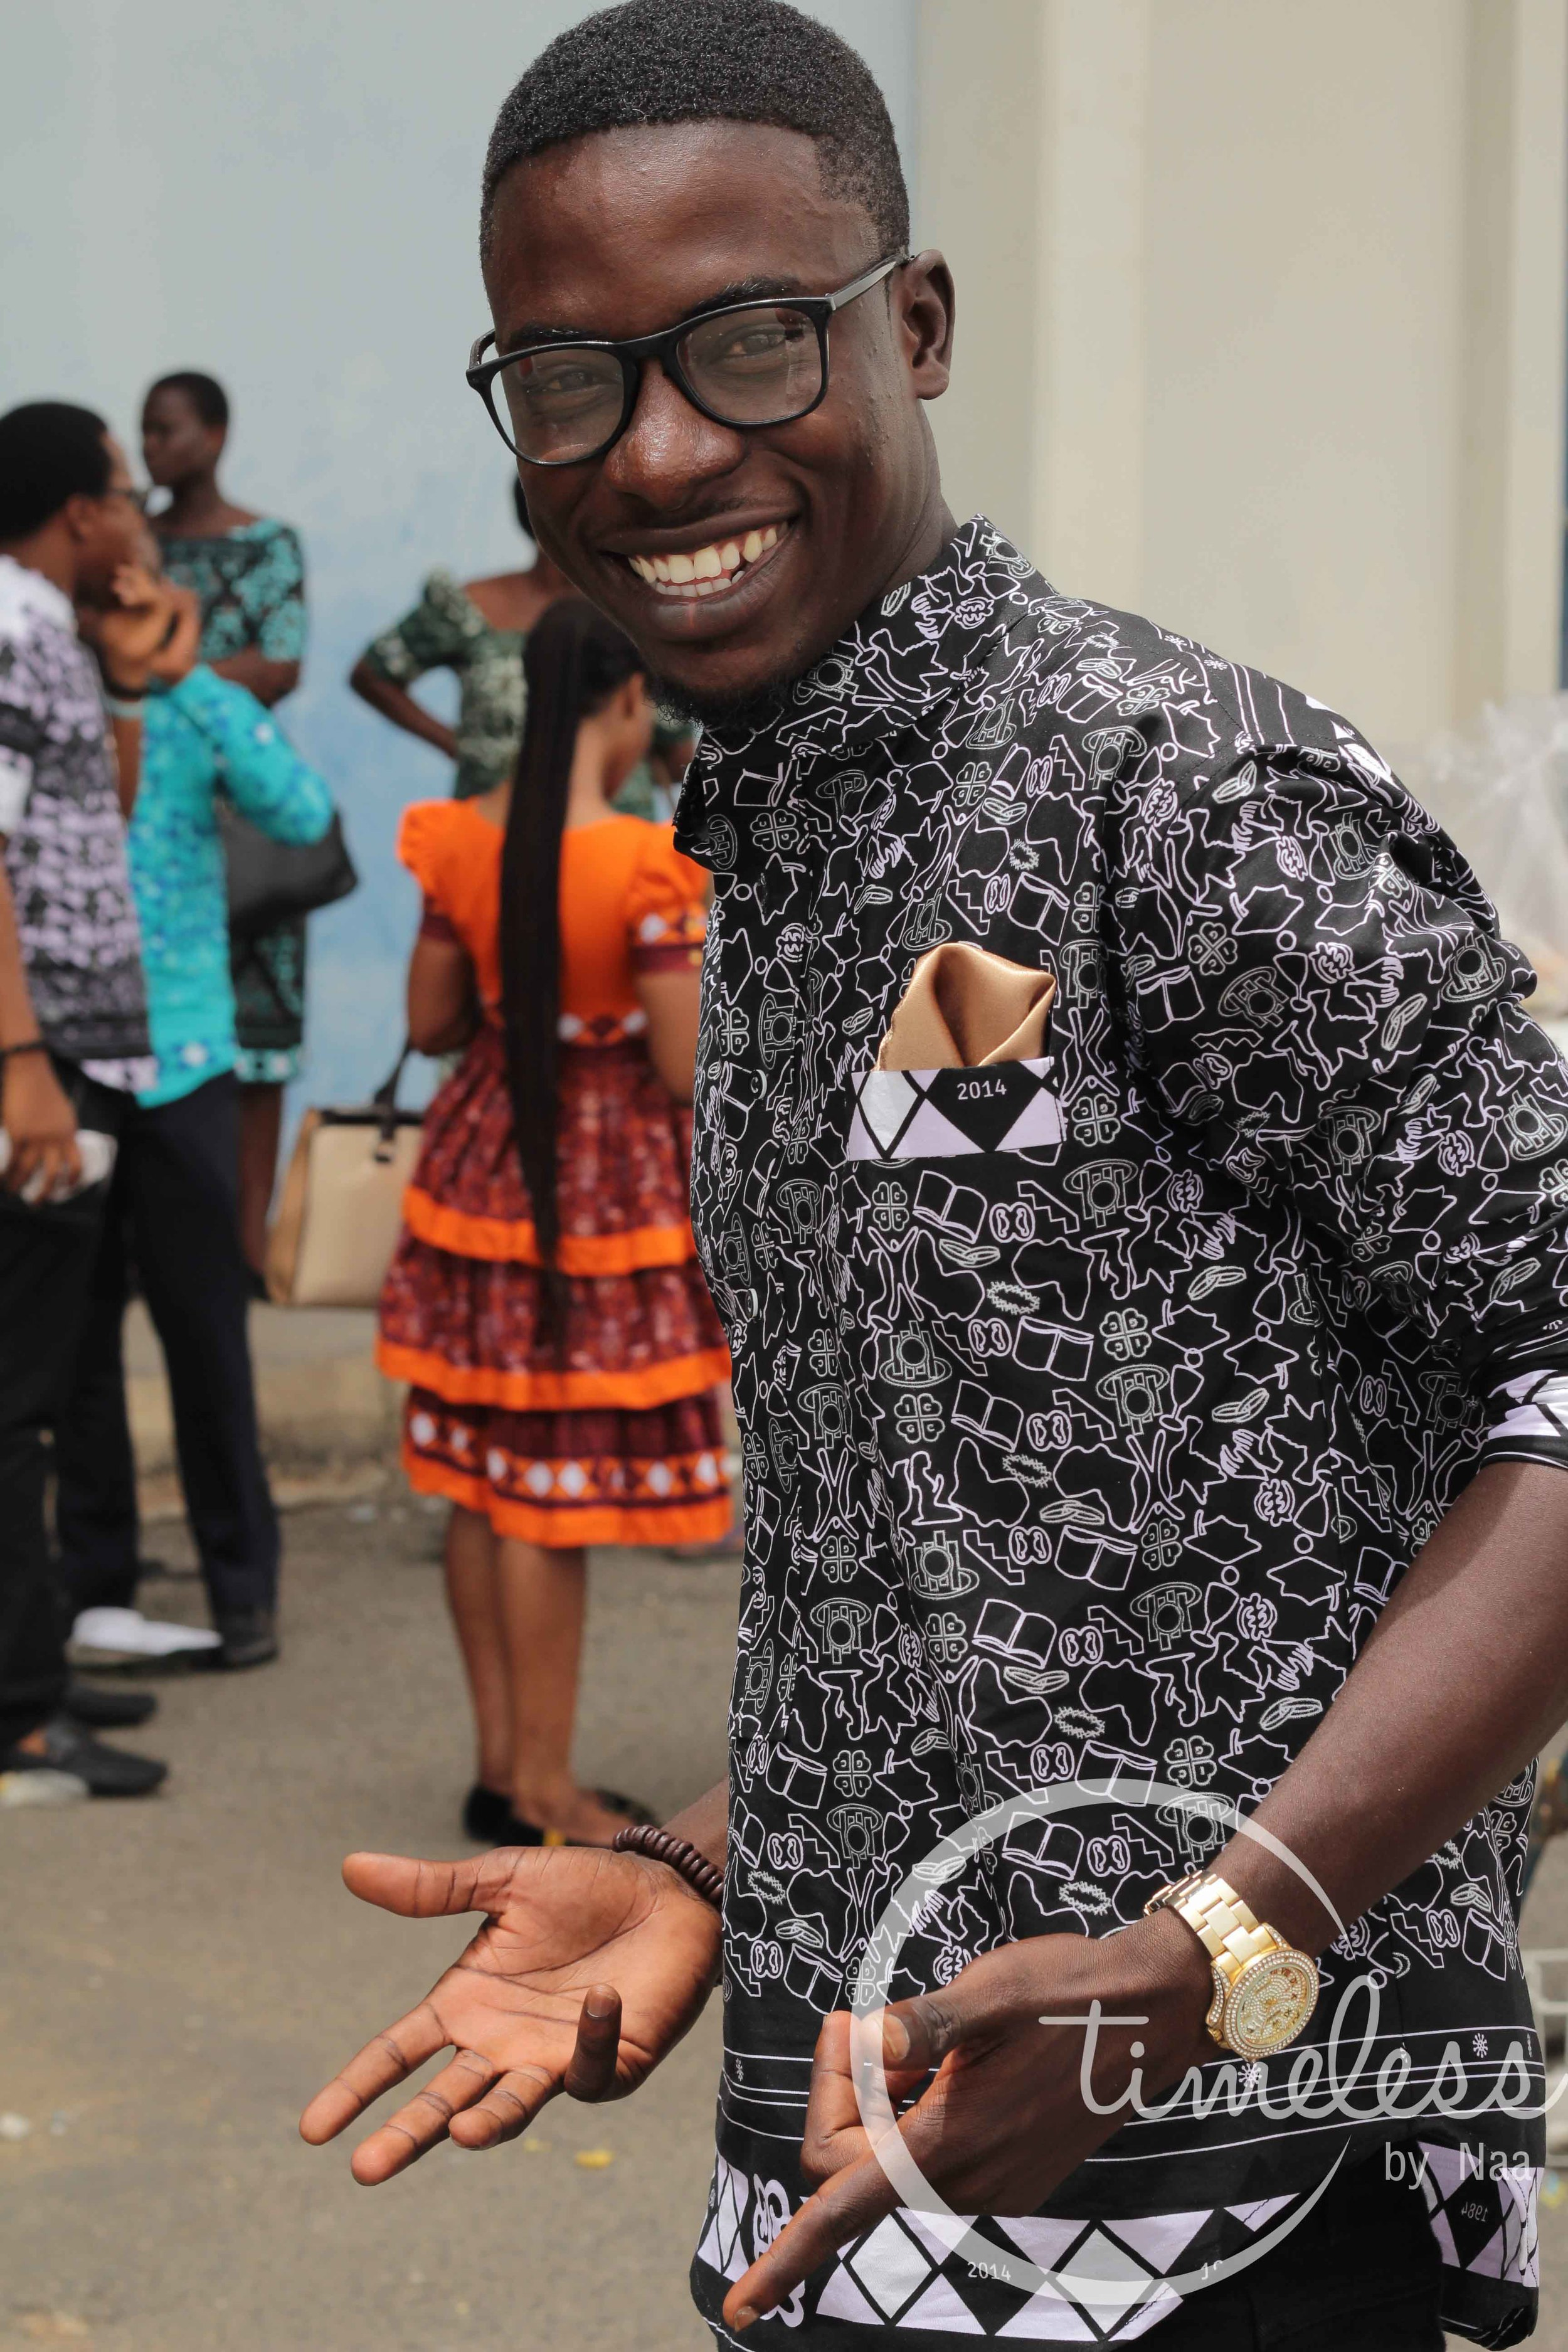 Emmanuel Bekoe feeling all swag